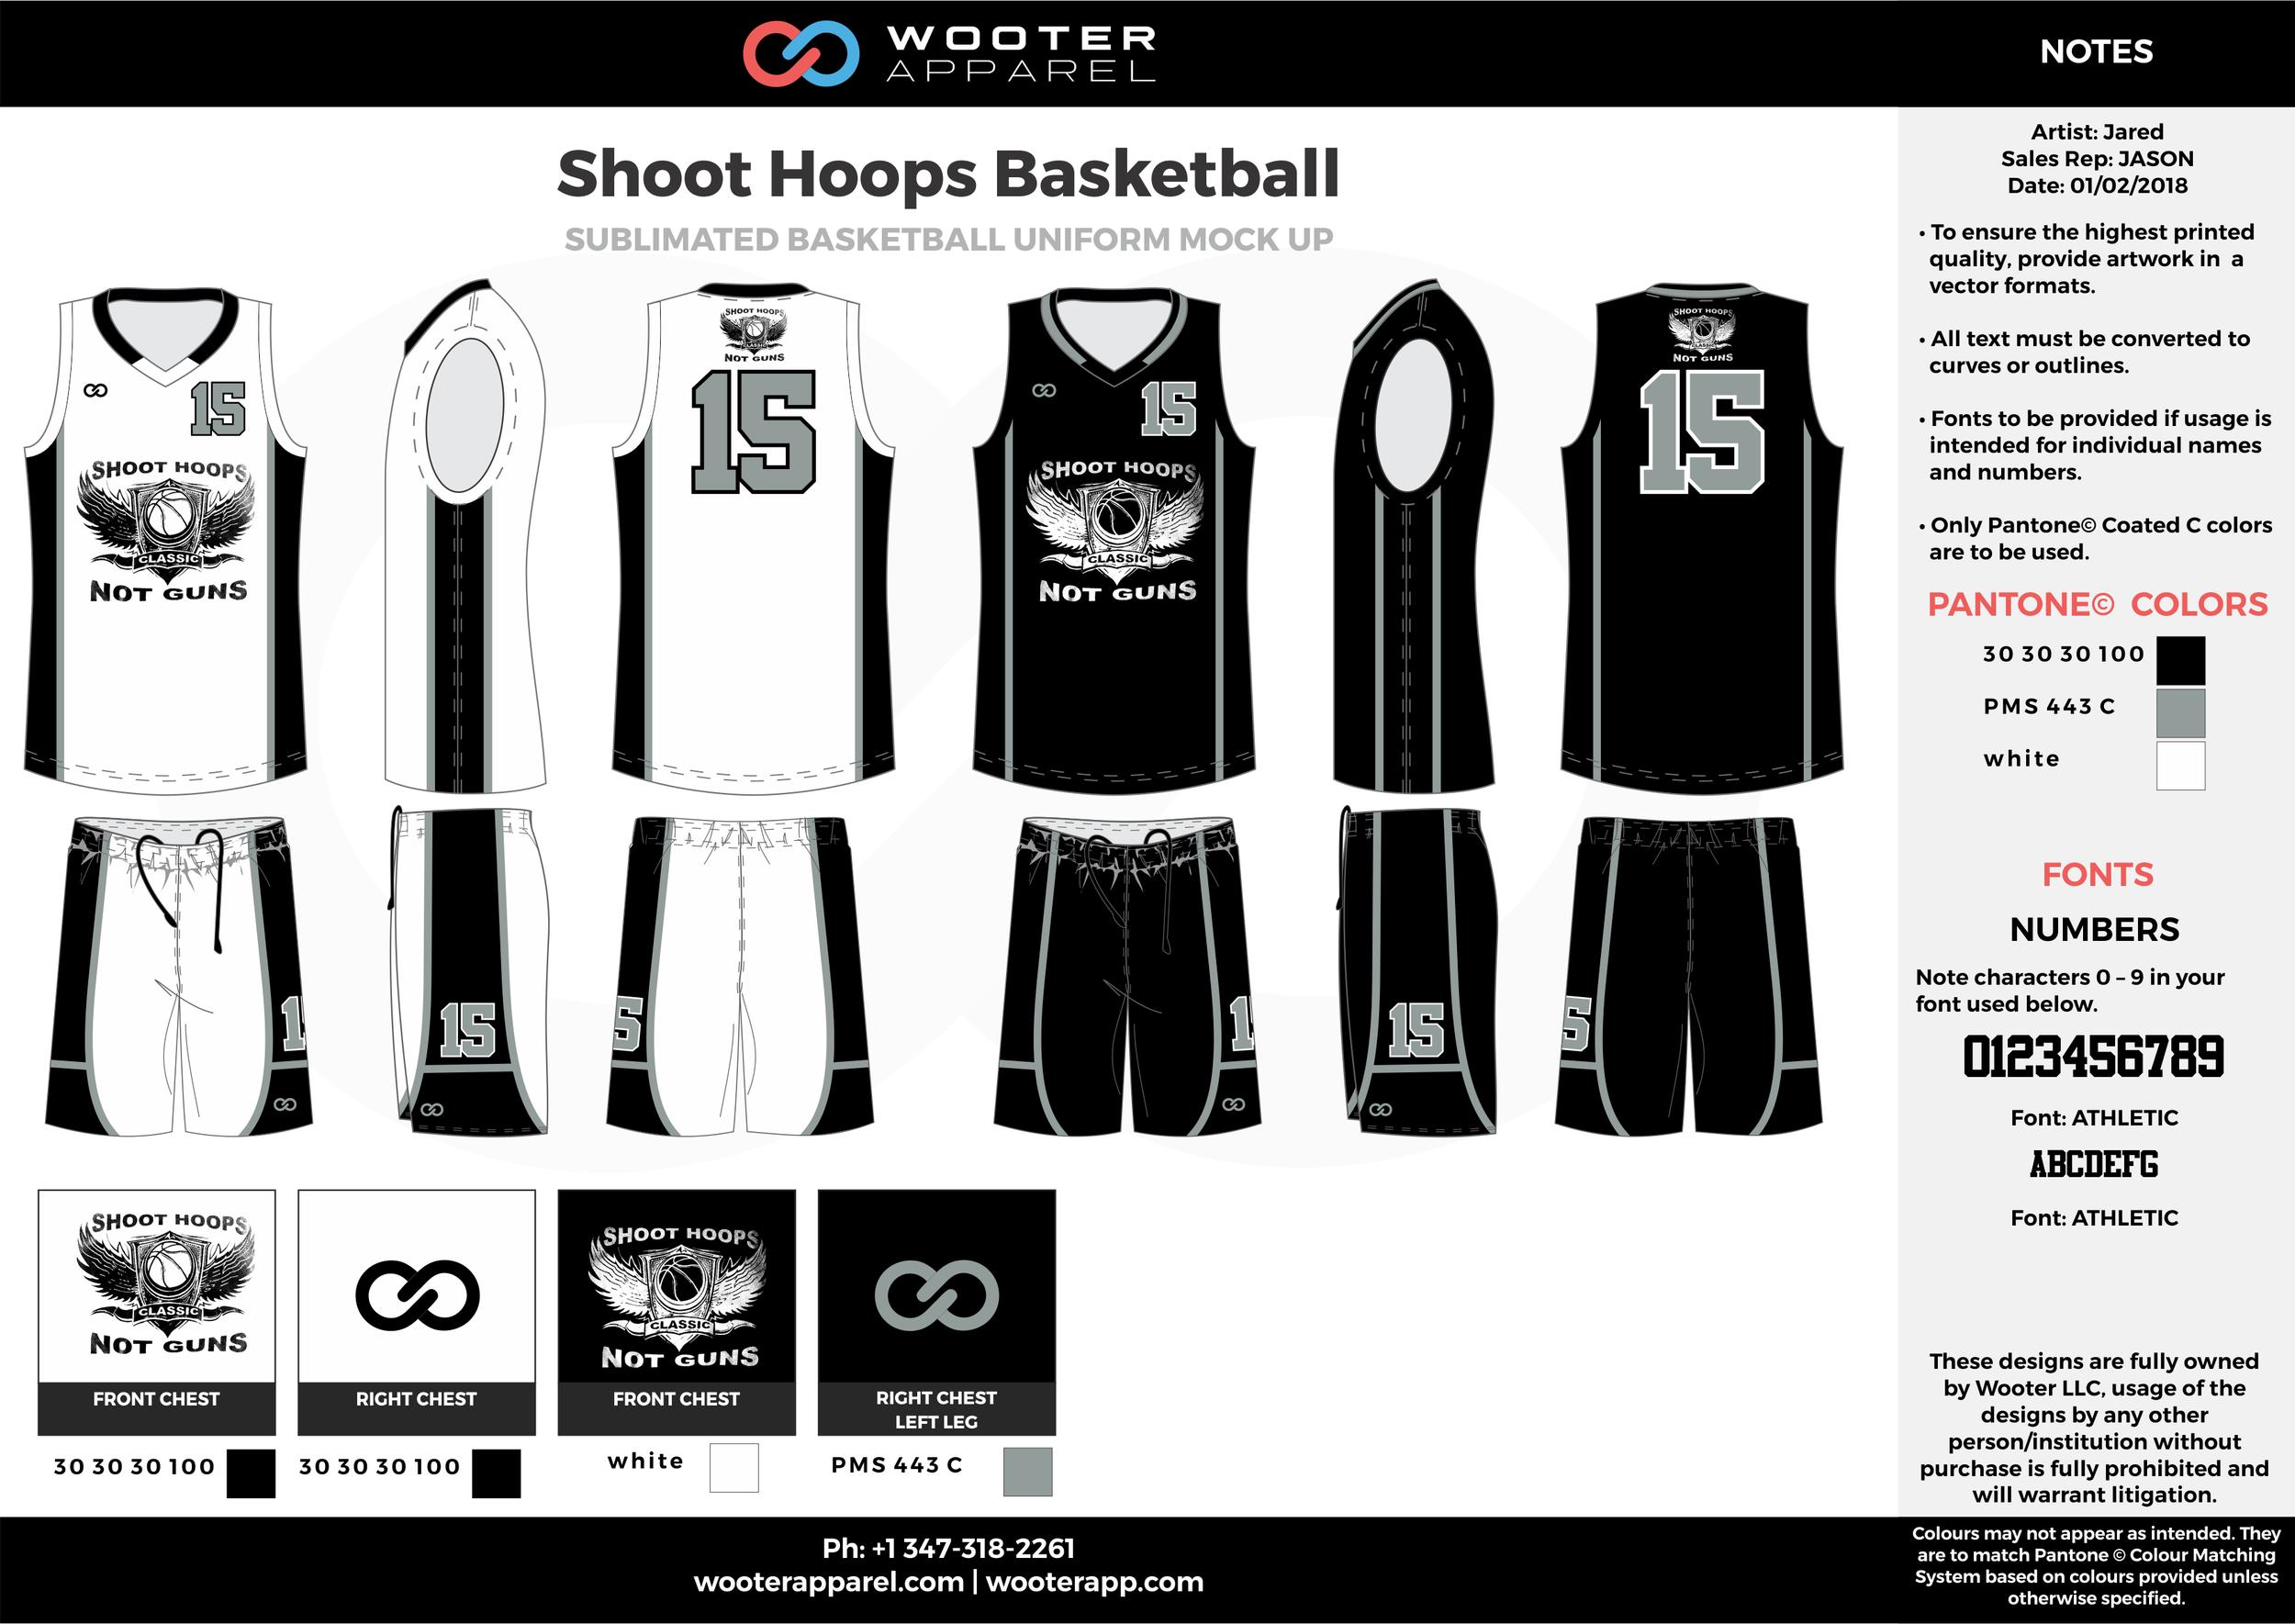 SHOOT HOOPS BASKETBALL black white gray Basketball Long Sleeve Shooting Shirt